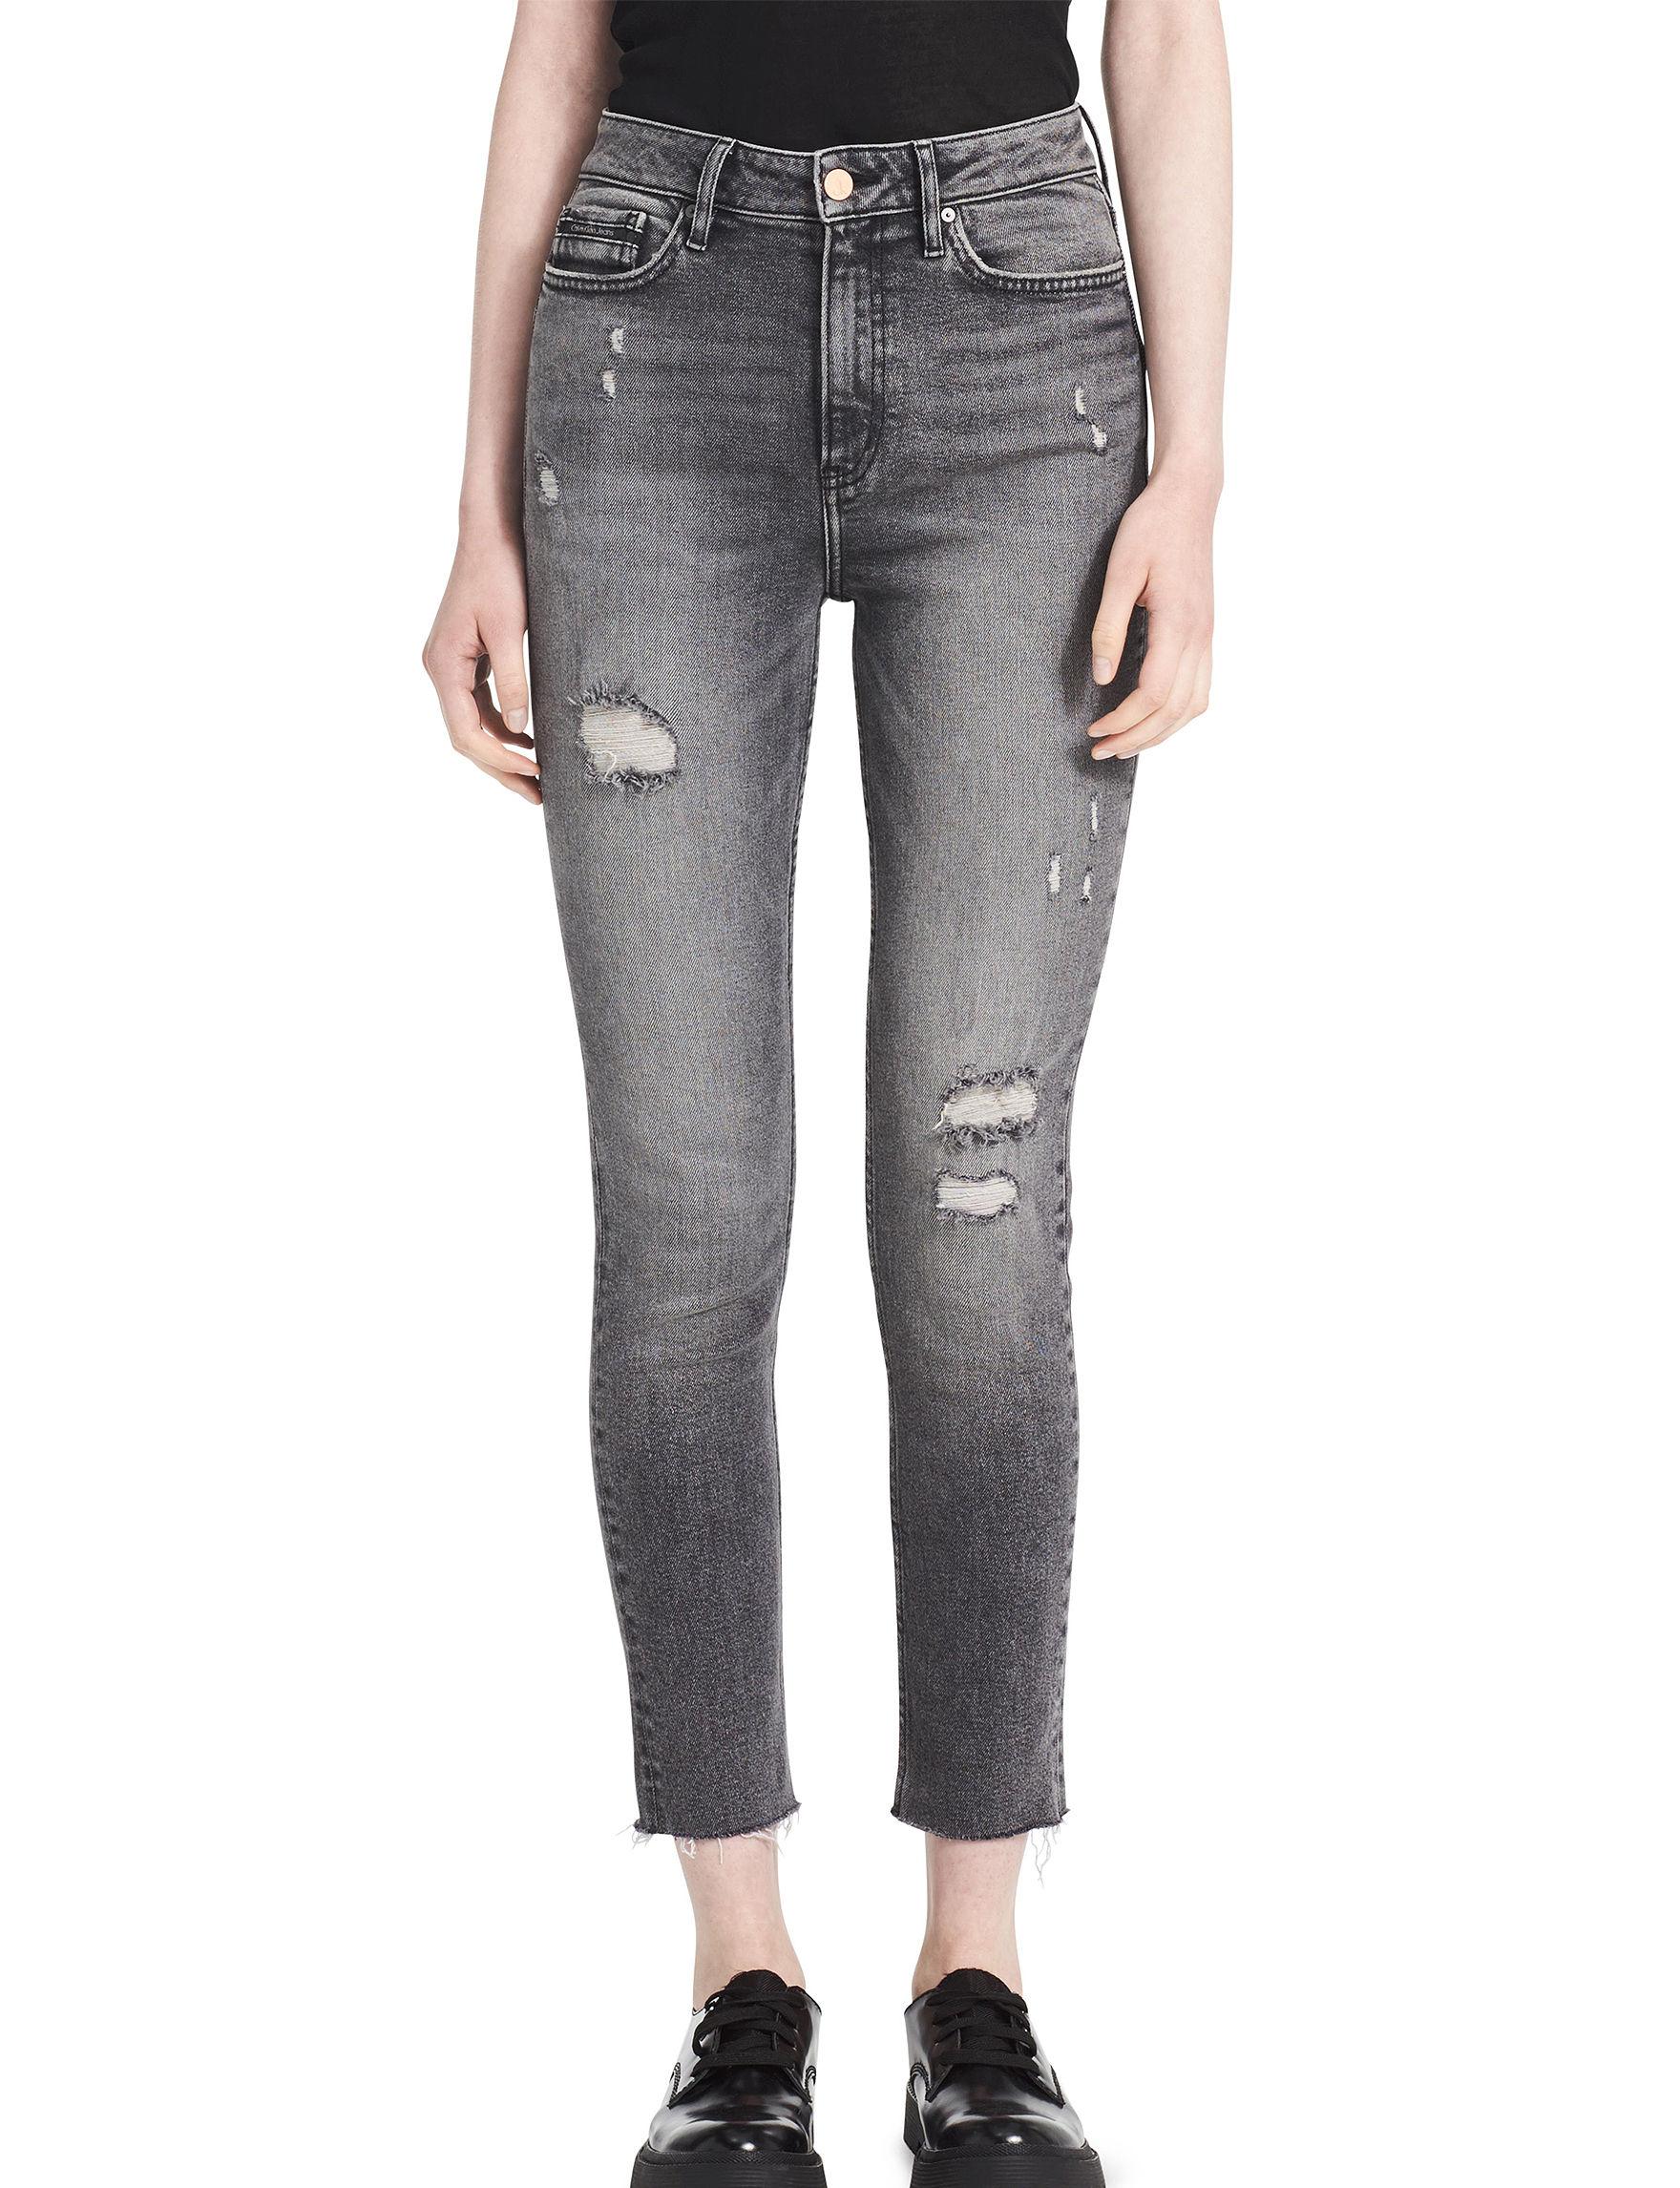 Calvin Klein Jeans Grey Skinny